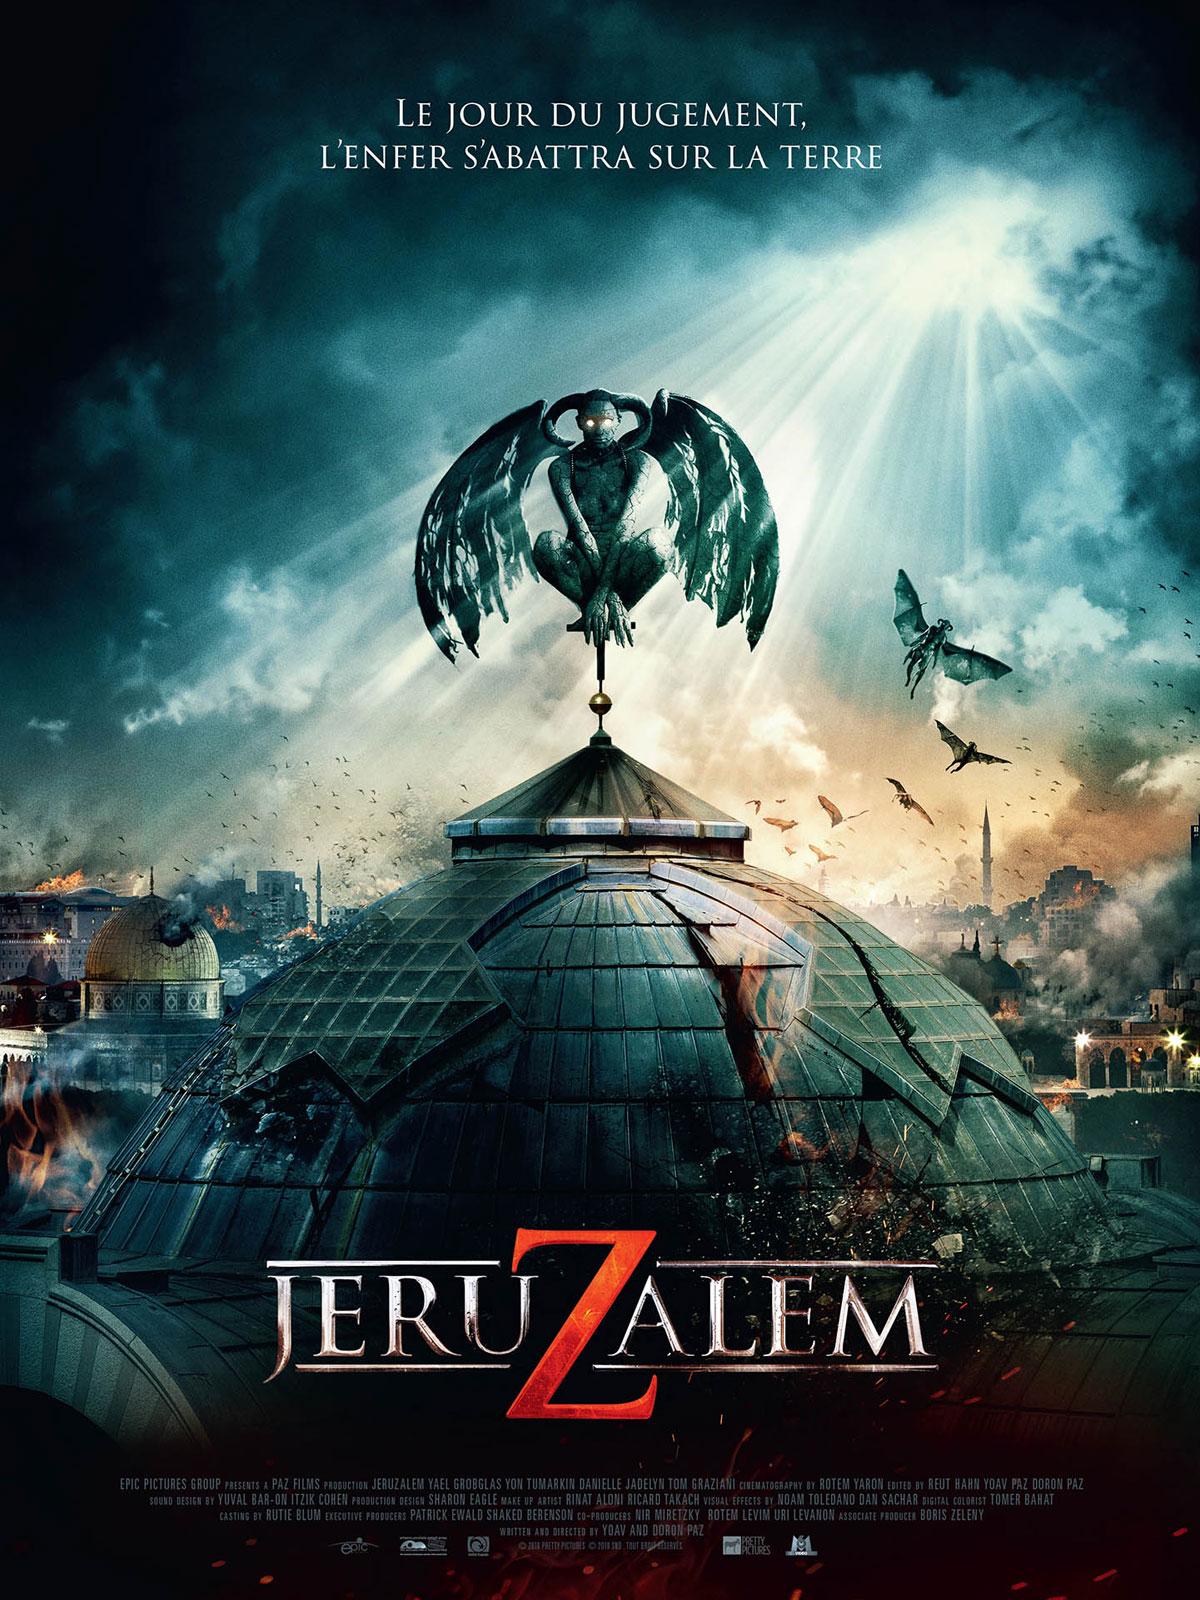 Jeruzalem, de Doron Paz et Yoav Paz